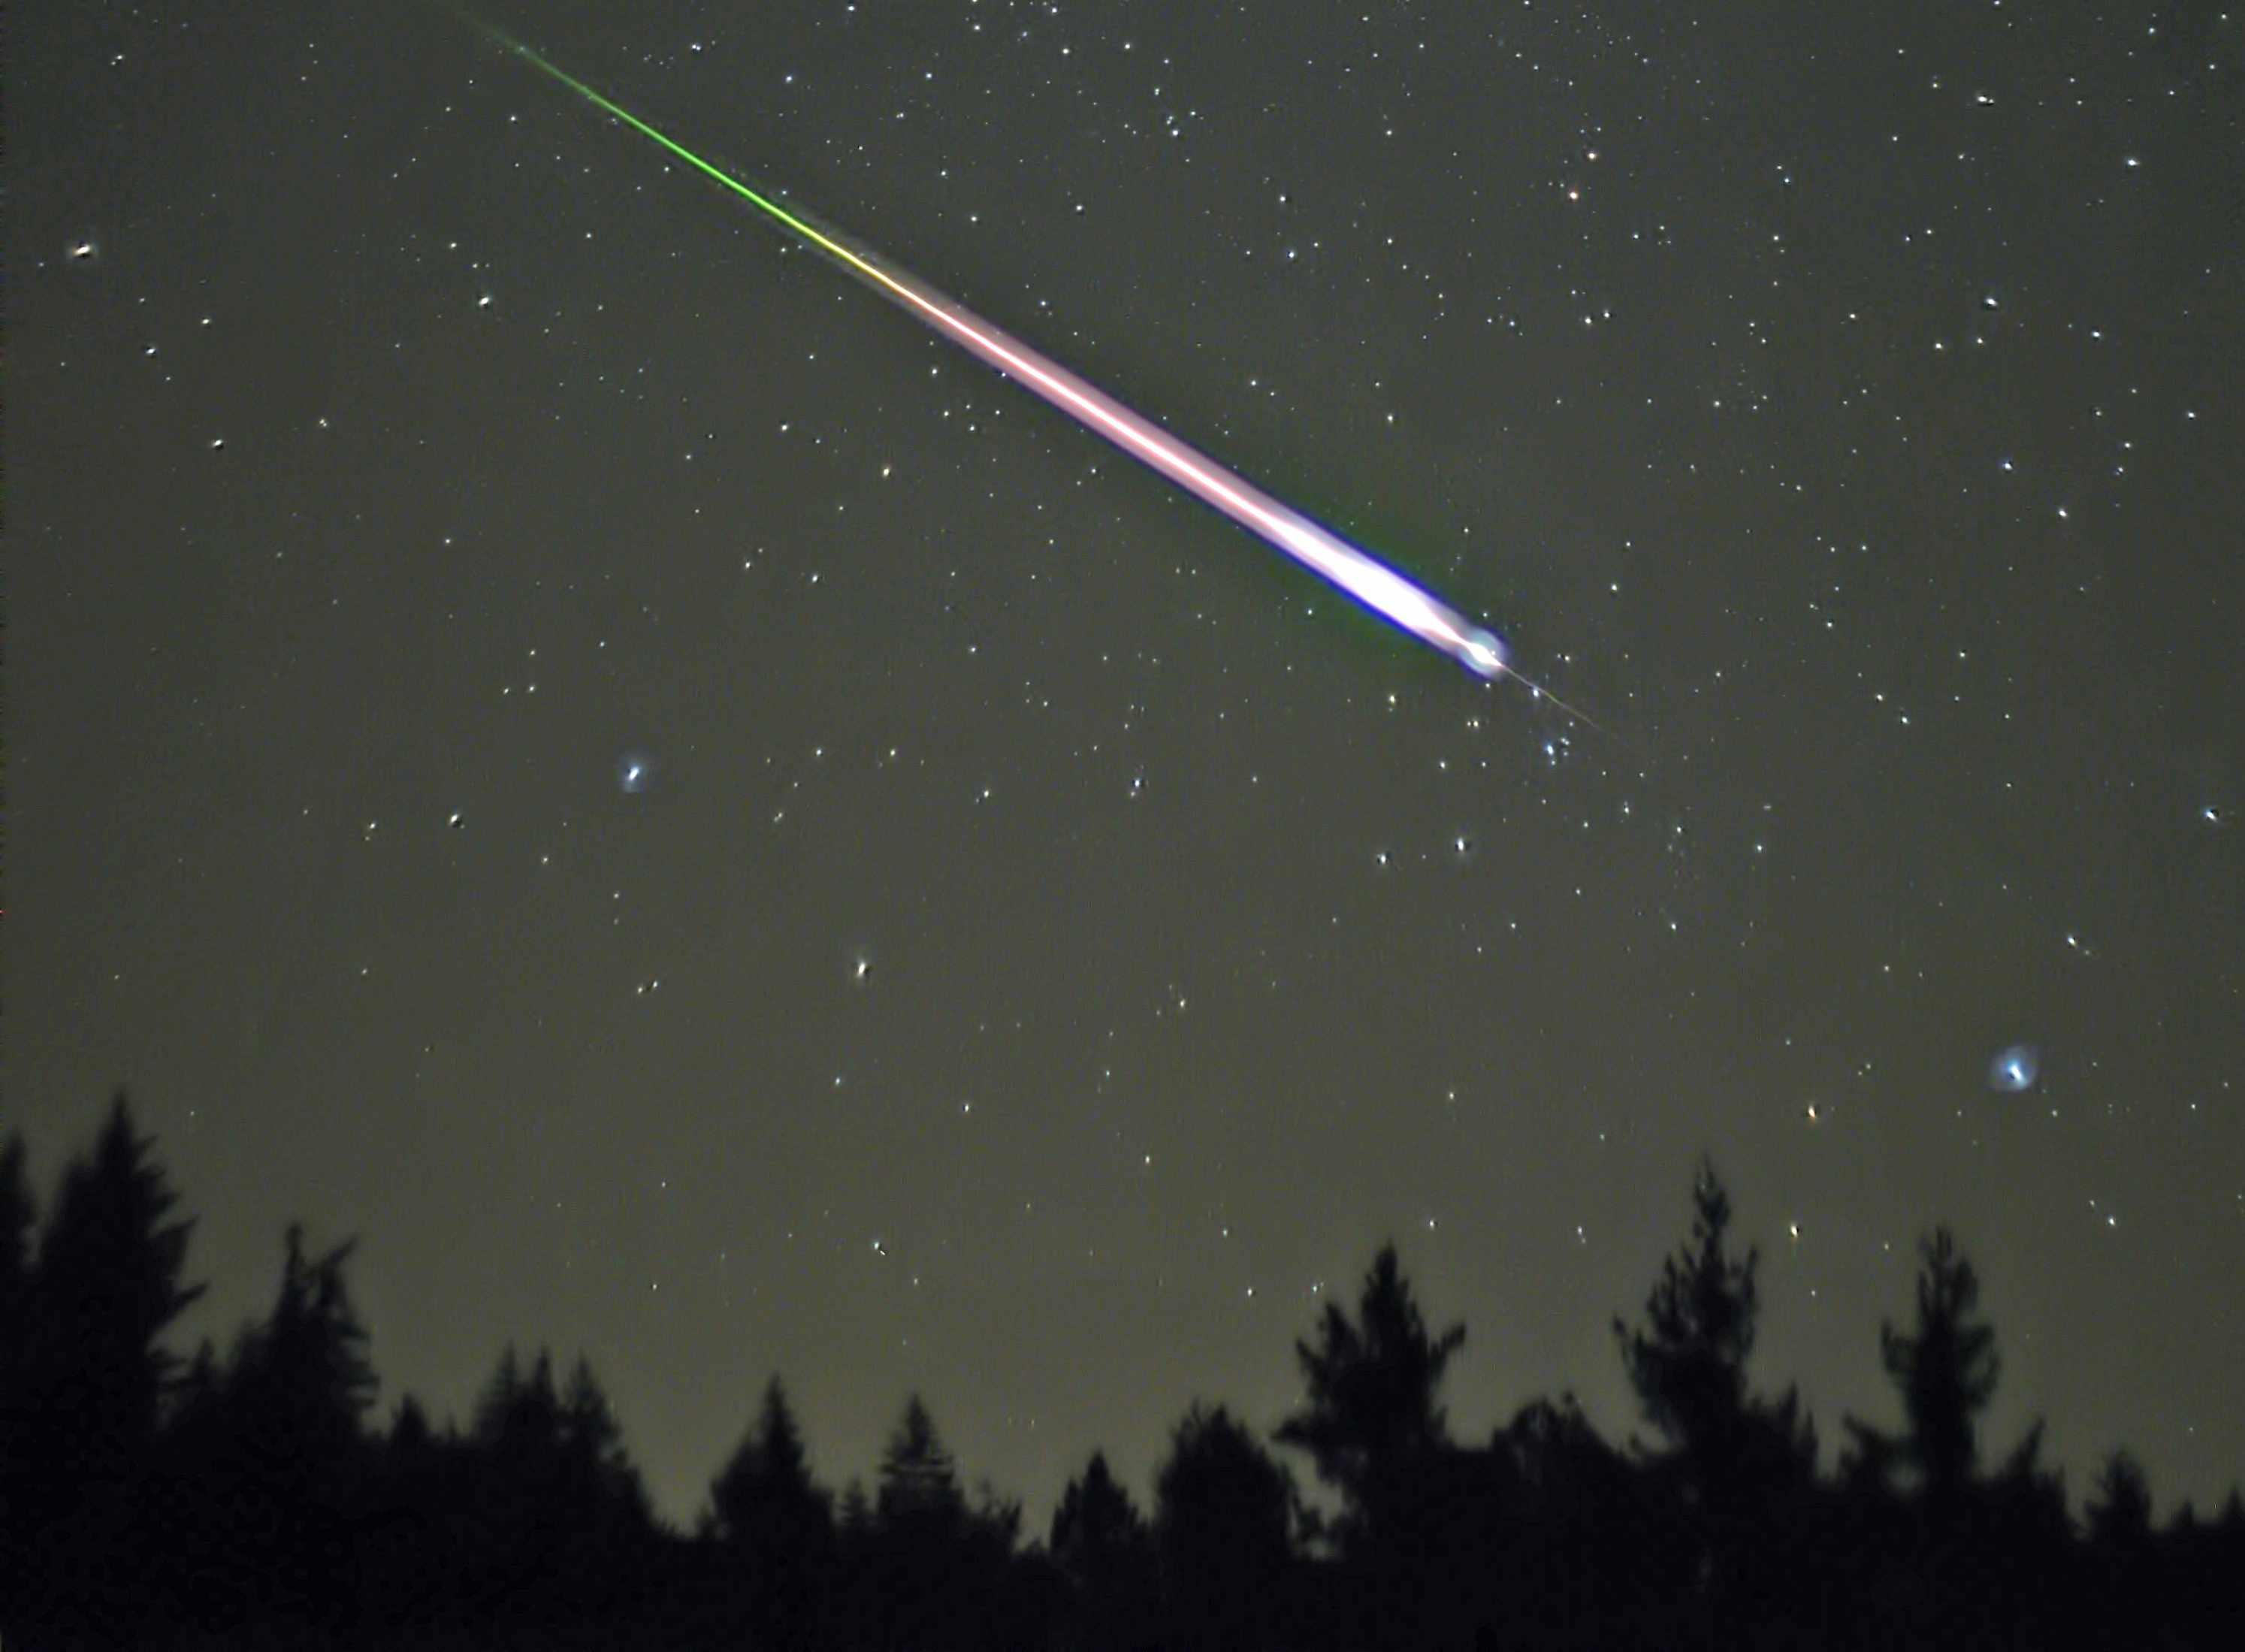 peak of 2009 Leonid meteor shower